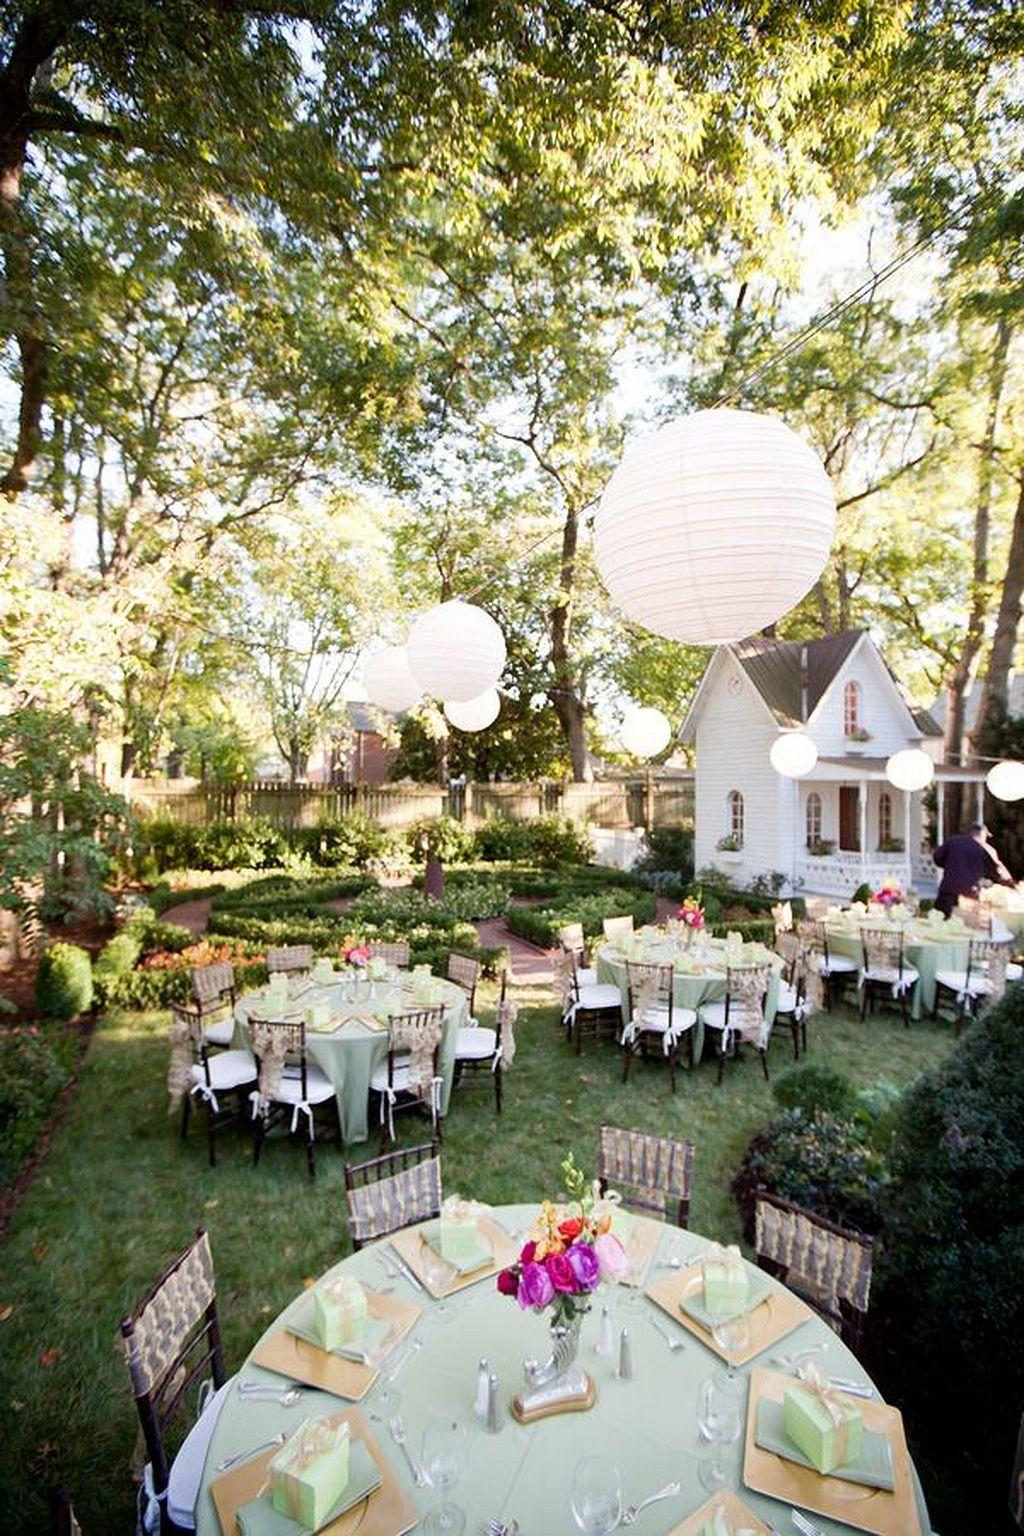 Backyard Wedding Planning - [audidatlevante.com]